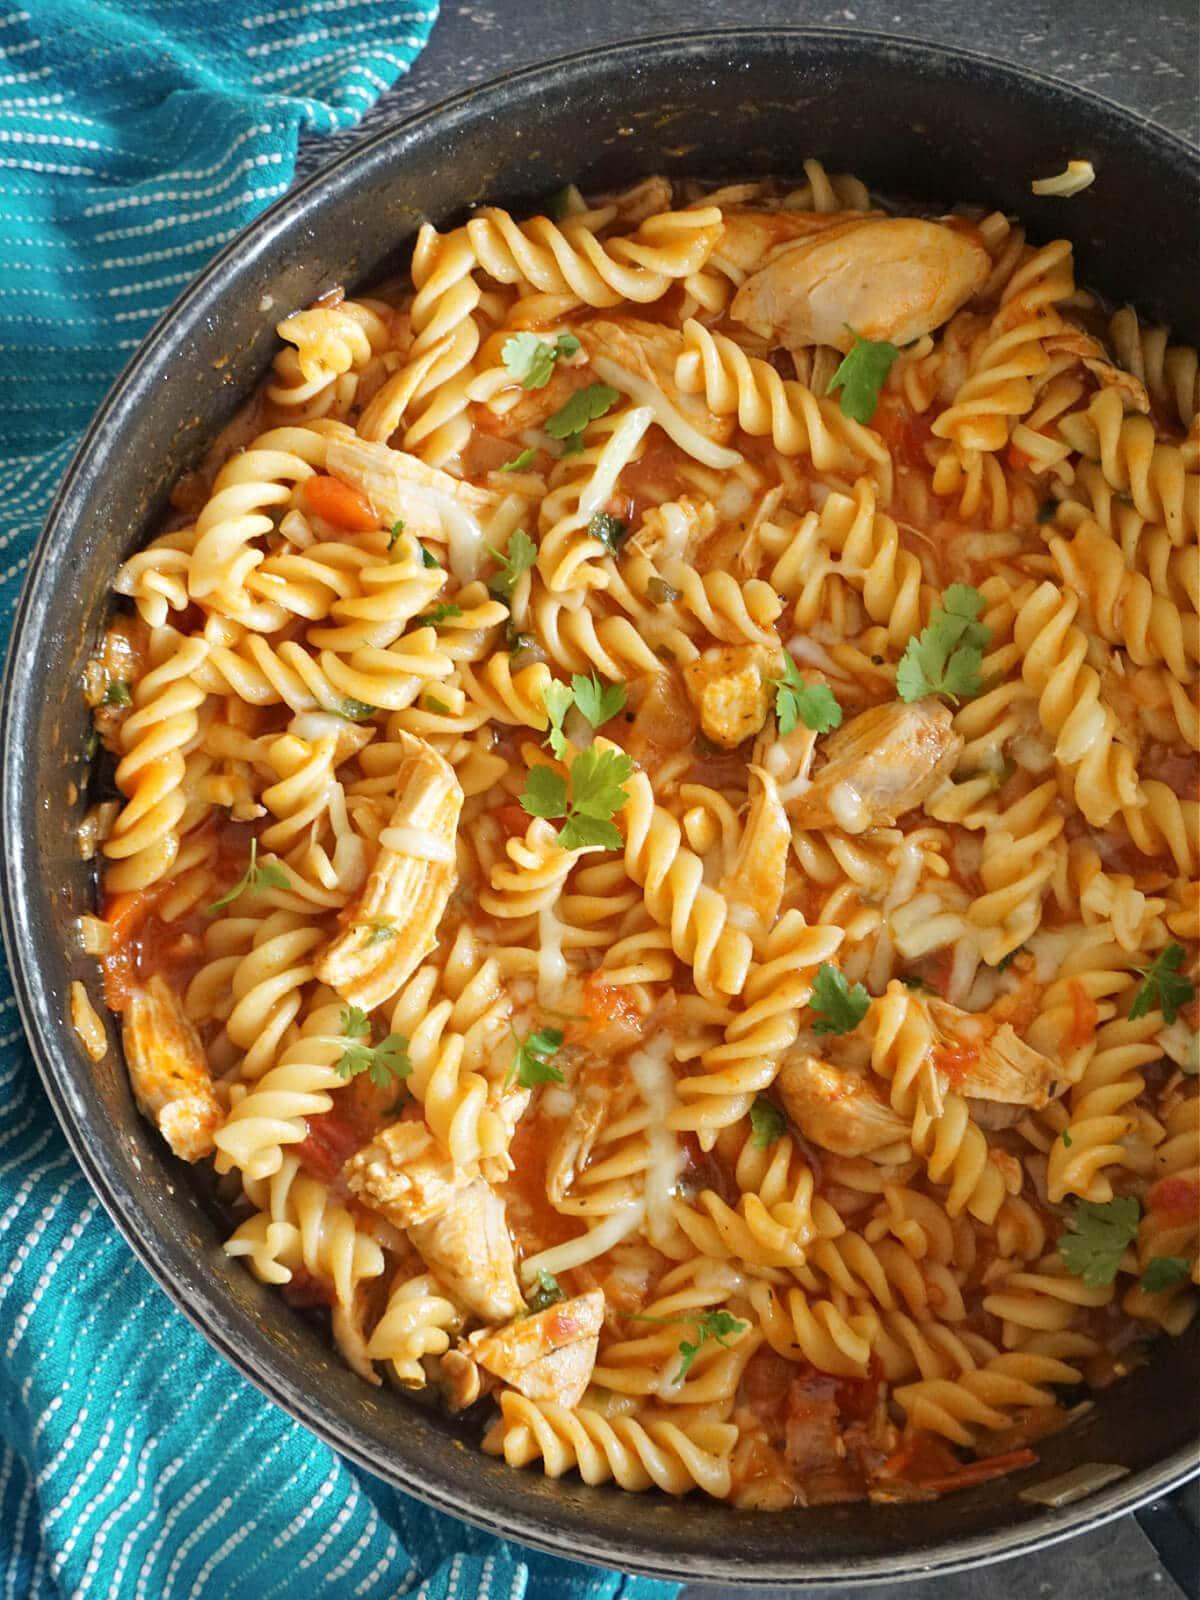 A pot of chicken pasta